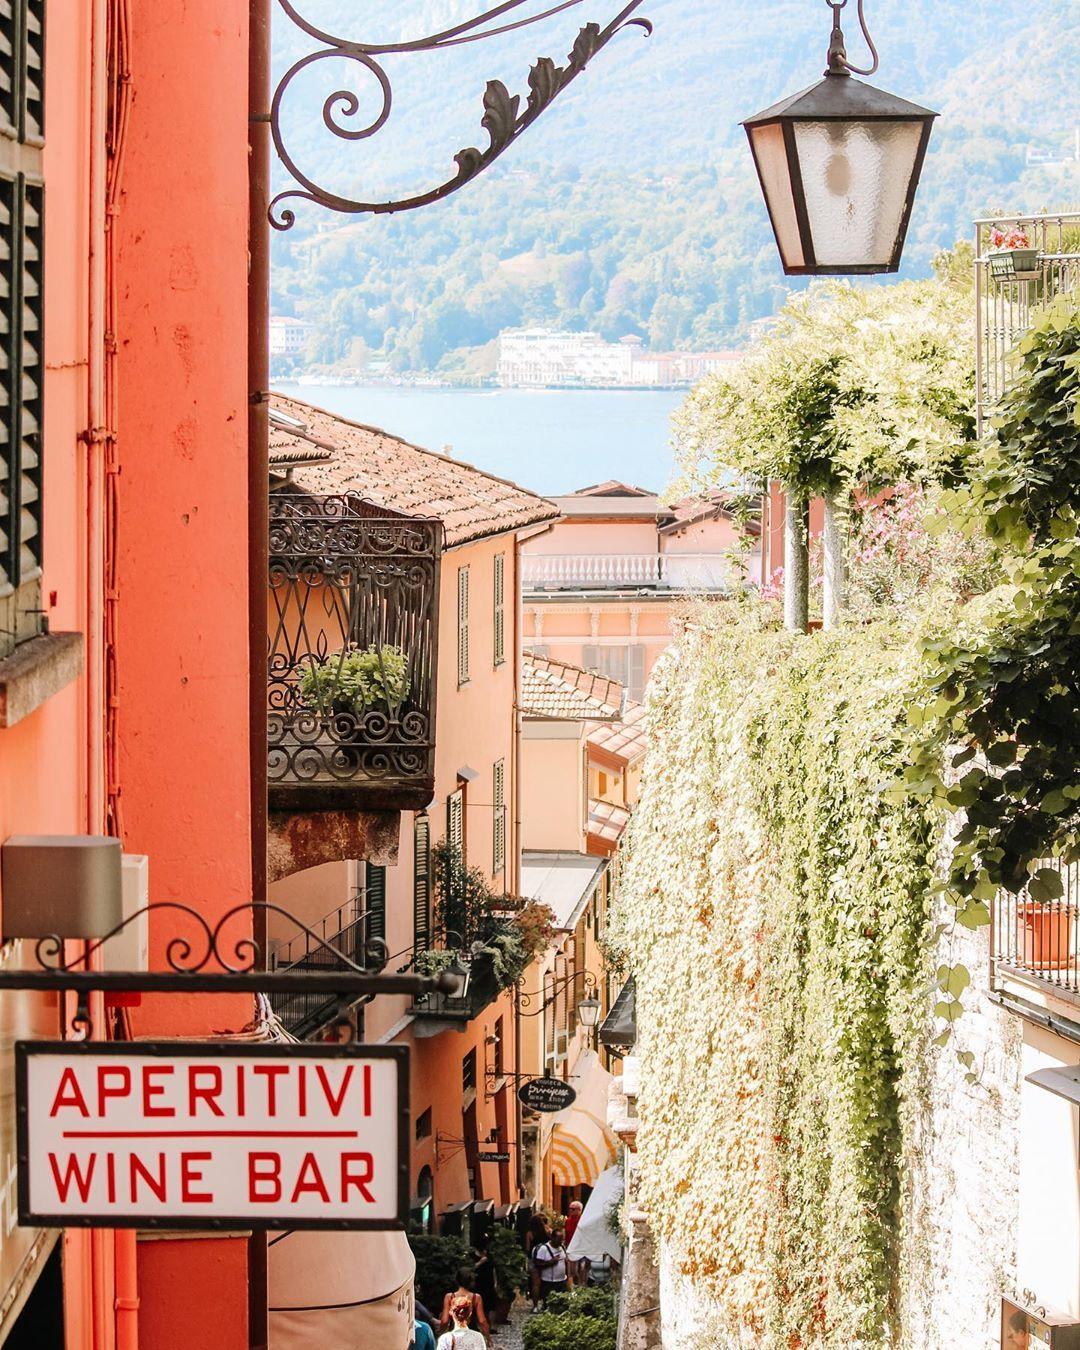 Bellagio #forzaitalia #tuttoandràbene #travelmemories #ig_captures #ig_italia #ig_italy #lombardy #lagodicomo #travelpho...